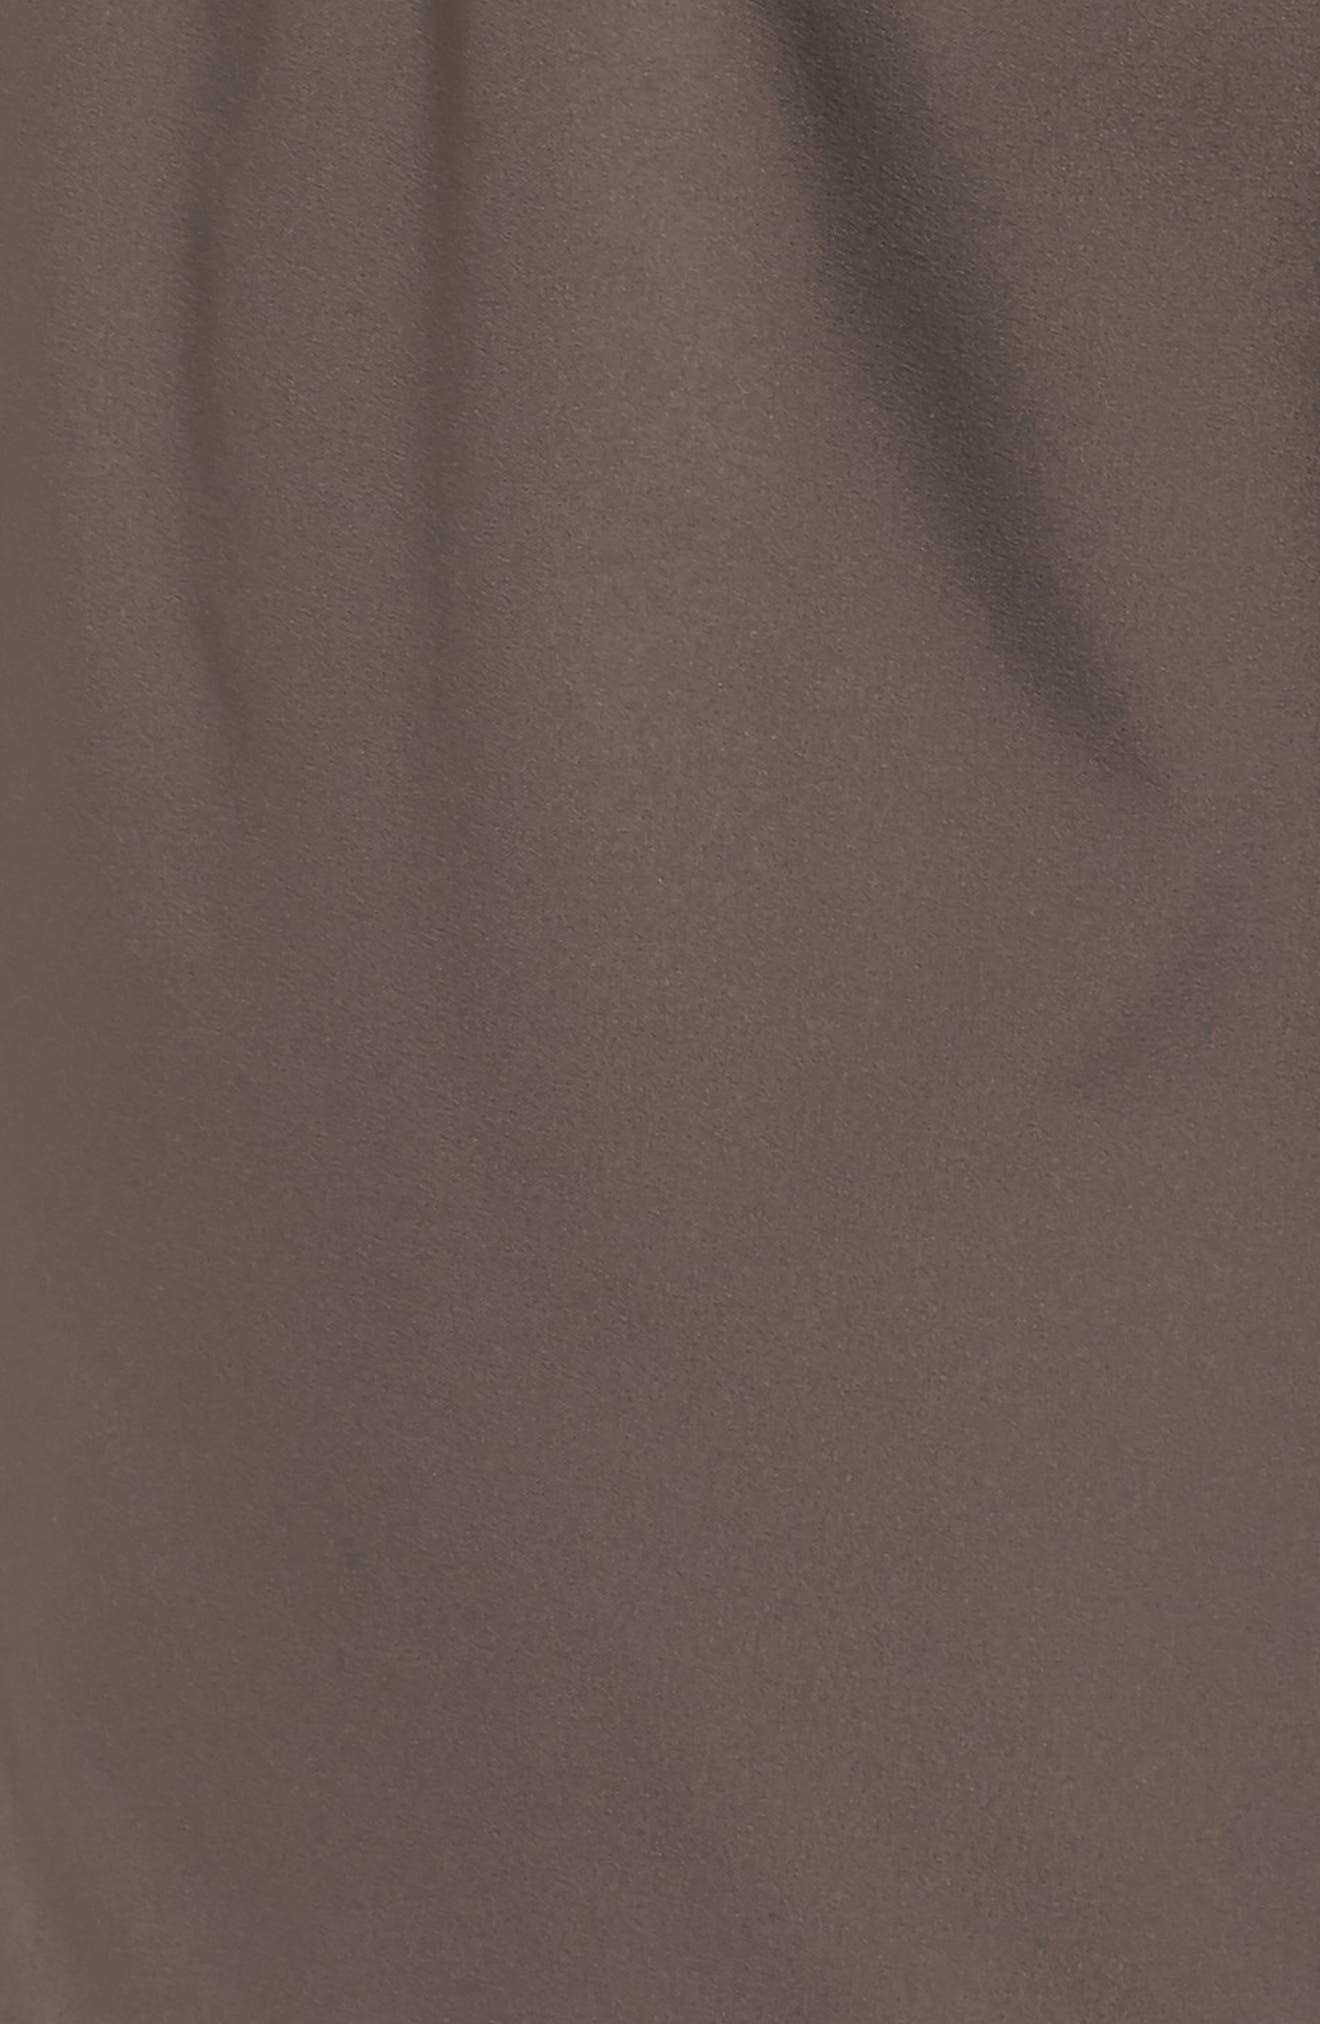 Flex Dri-FIT Running Shorts,                             Alternate thumbnail 6, color,                             Ridgerock